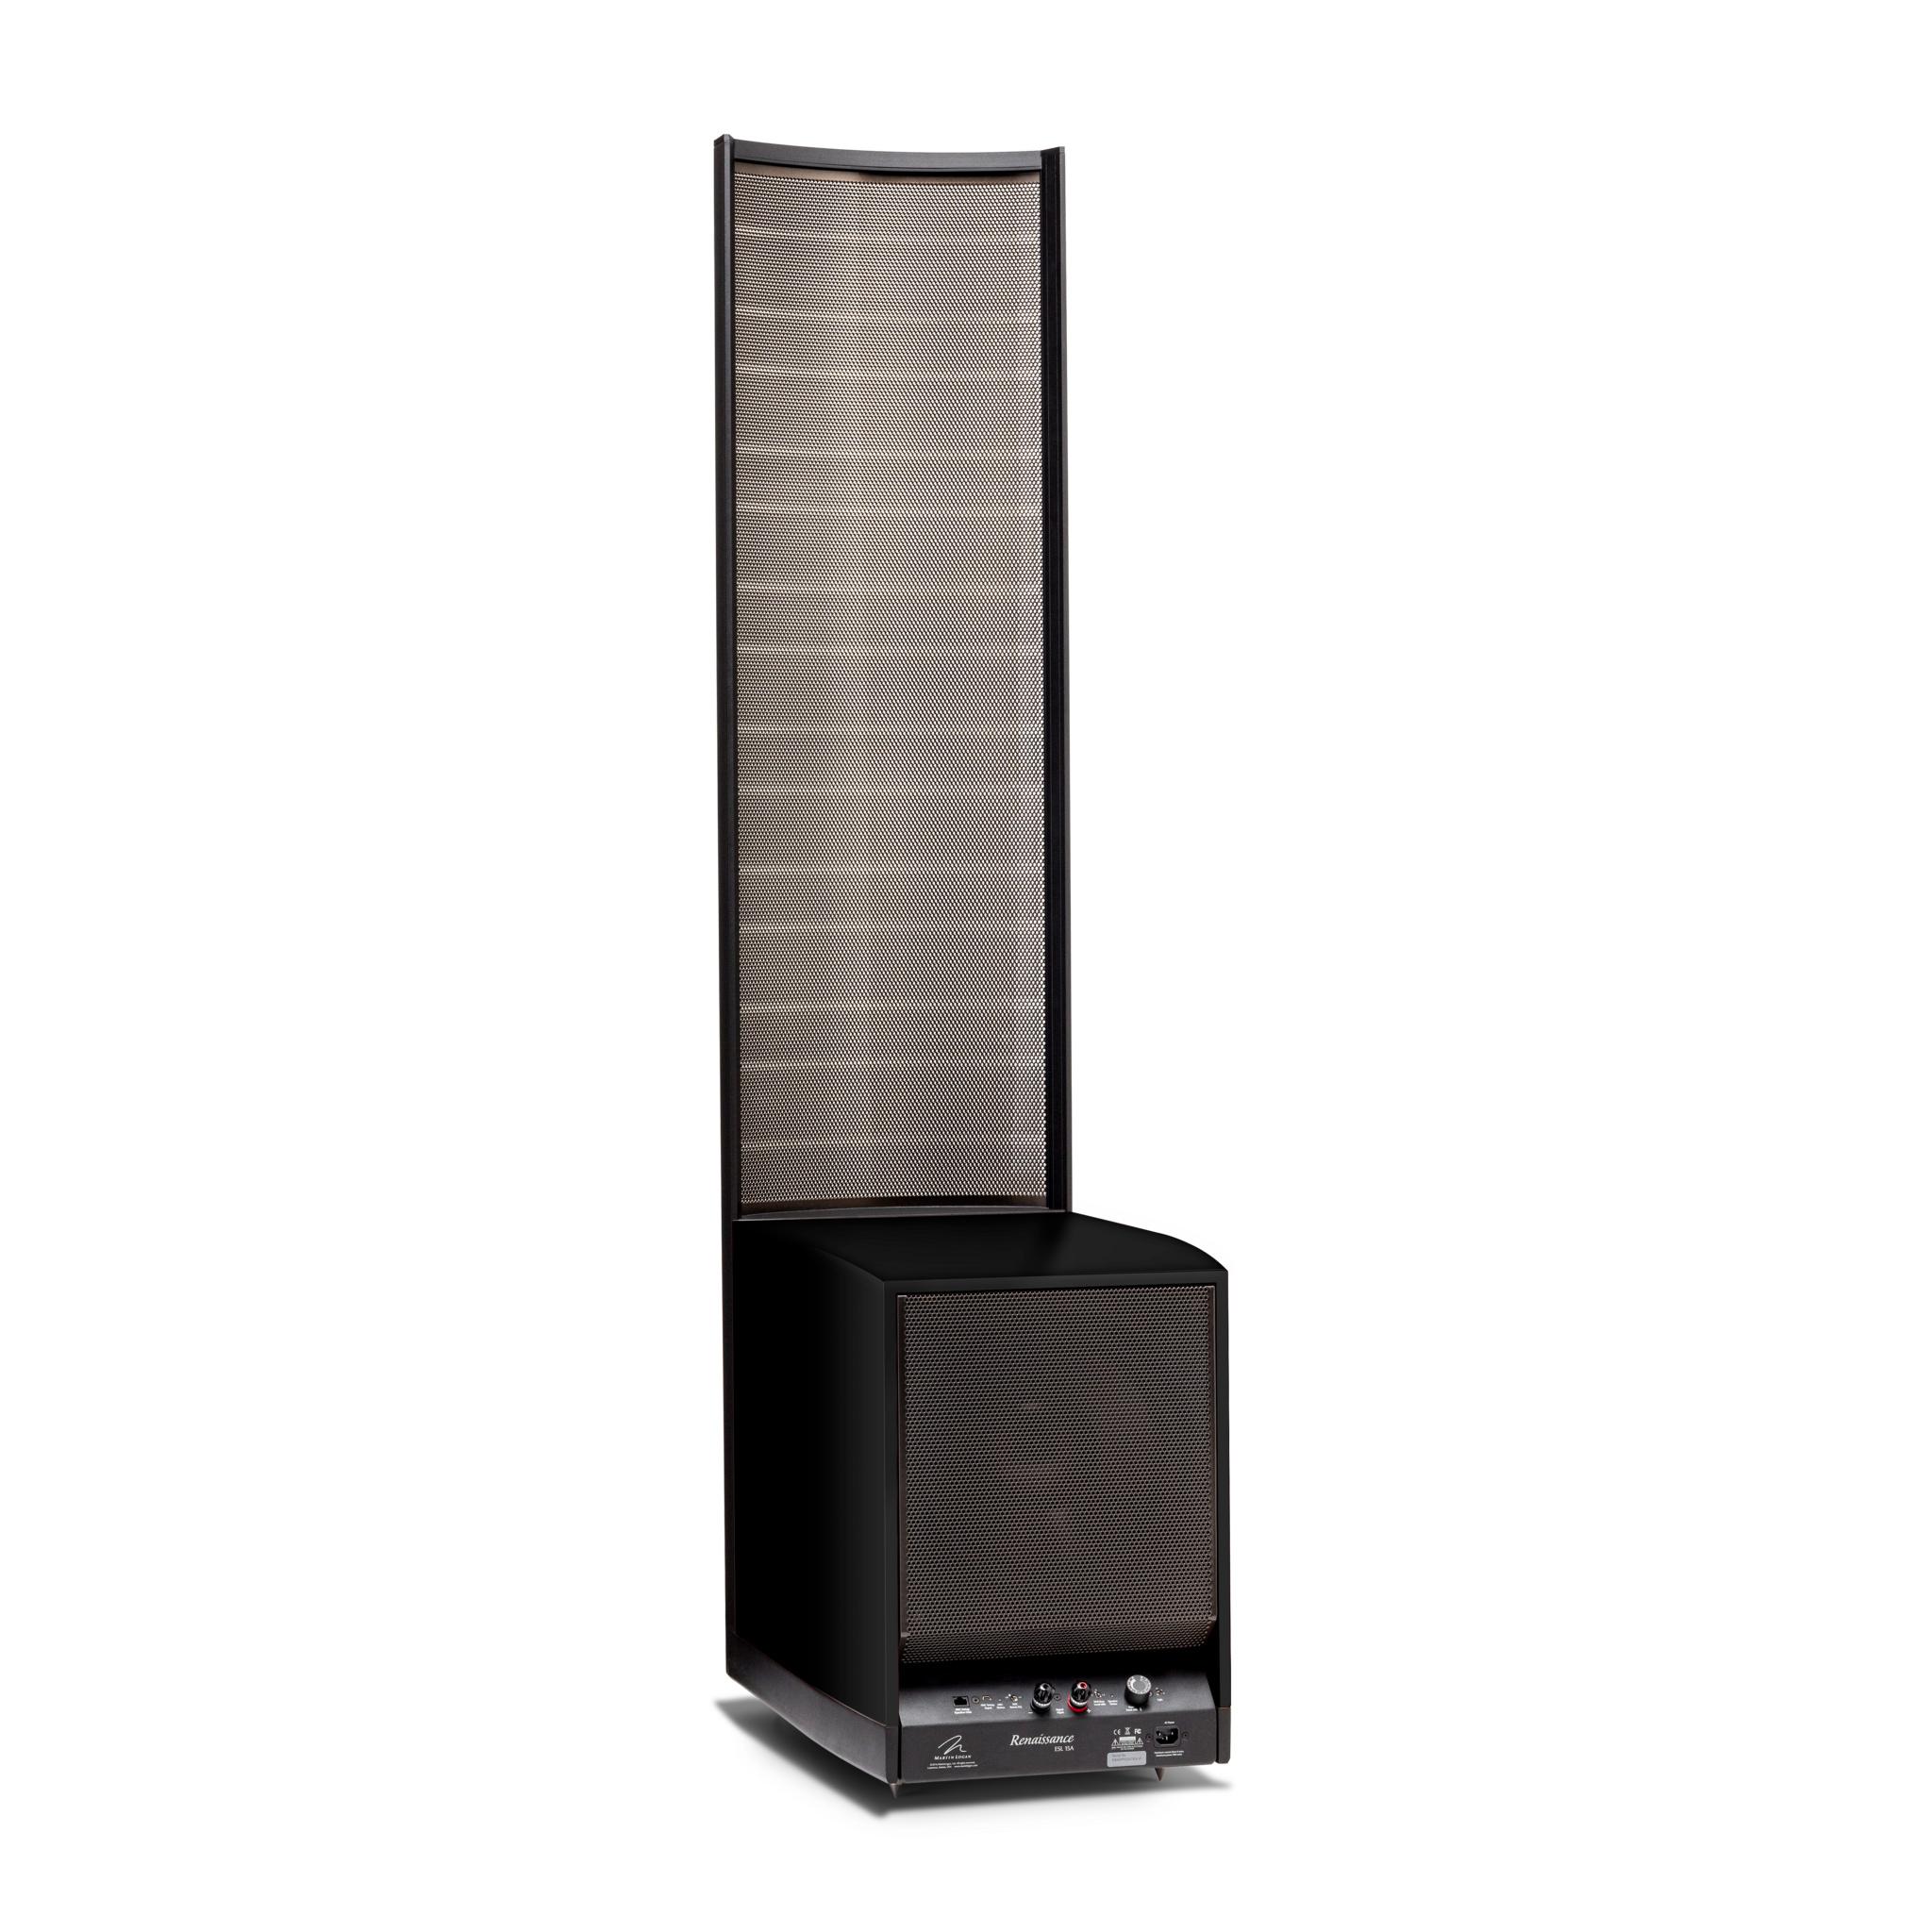 martin logan esl lautsprecher bei alex giese hifi audio. Black Bedroom Furniture Sets. Home Design Ideas